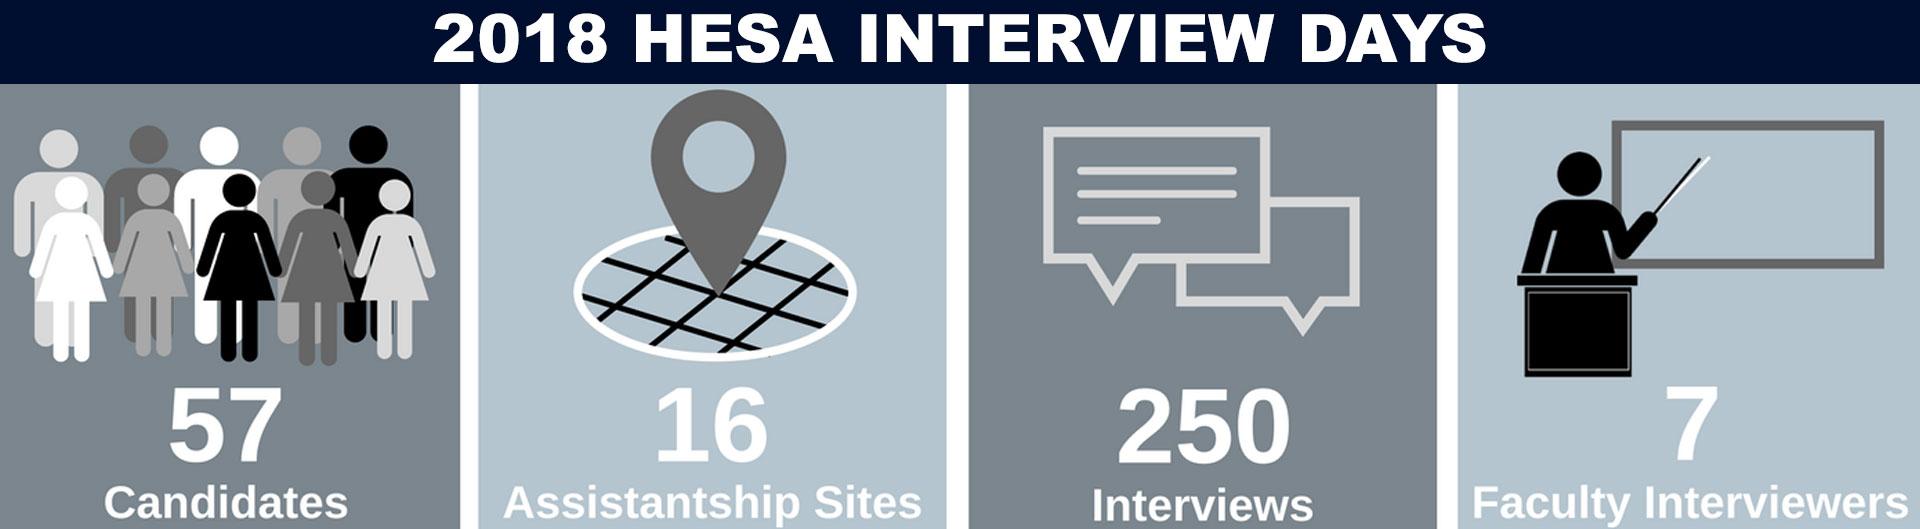 HESA Interview Days Infographic